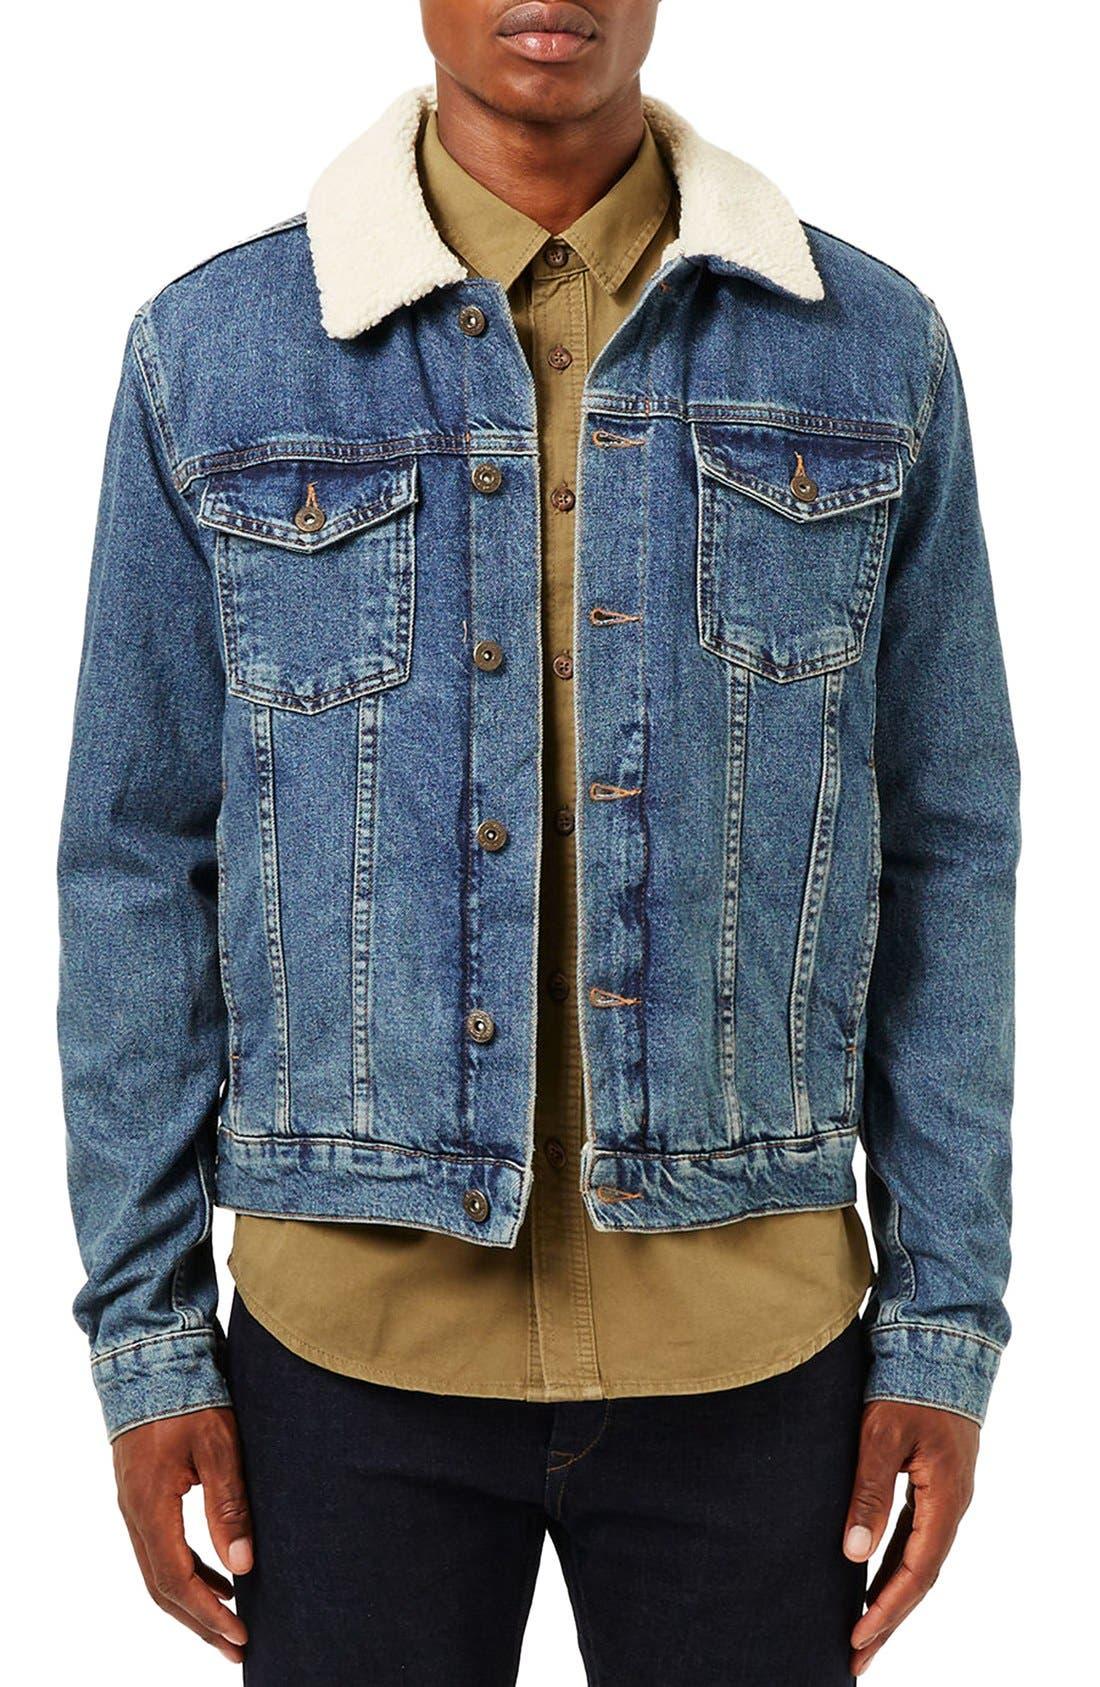 Alternate Image 1 Selected - Topman Borg Denim Jacket